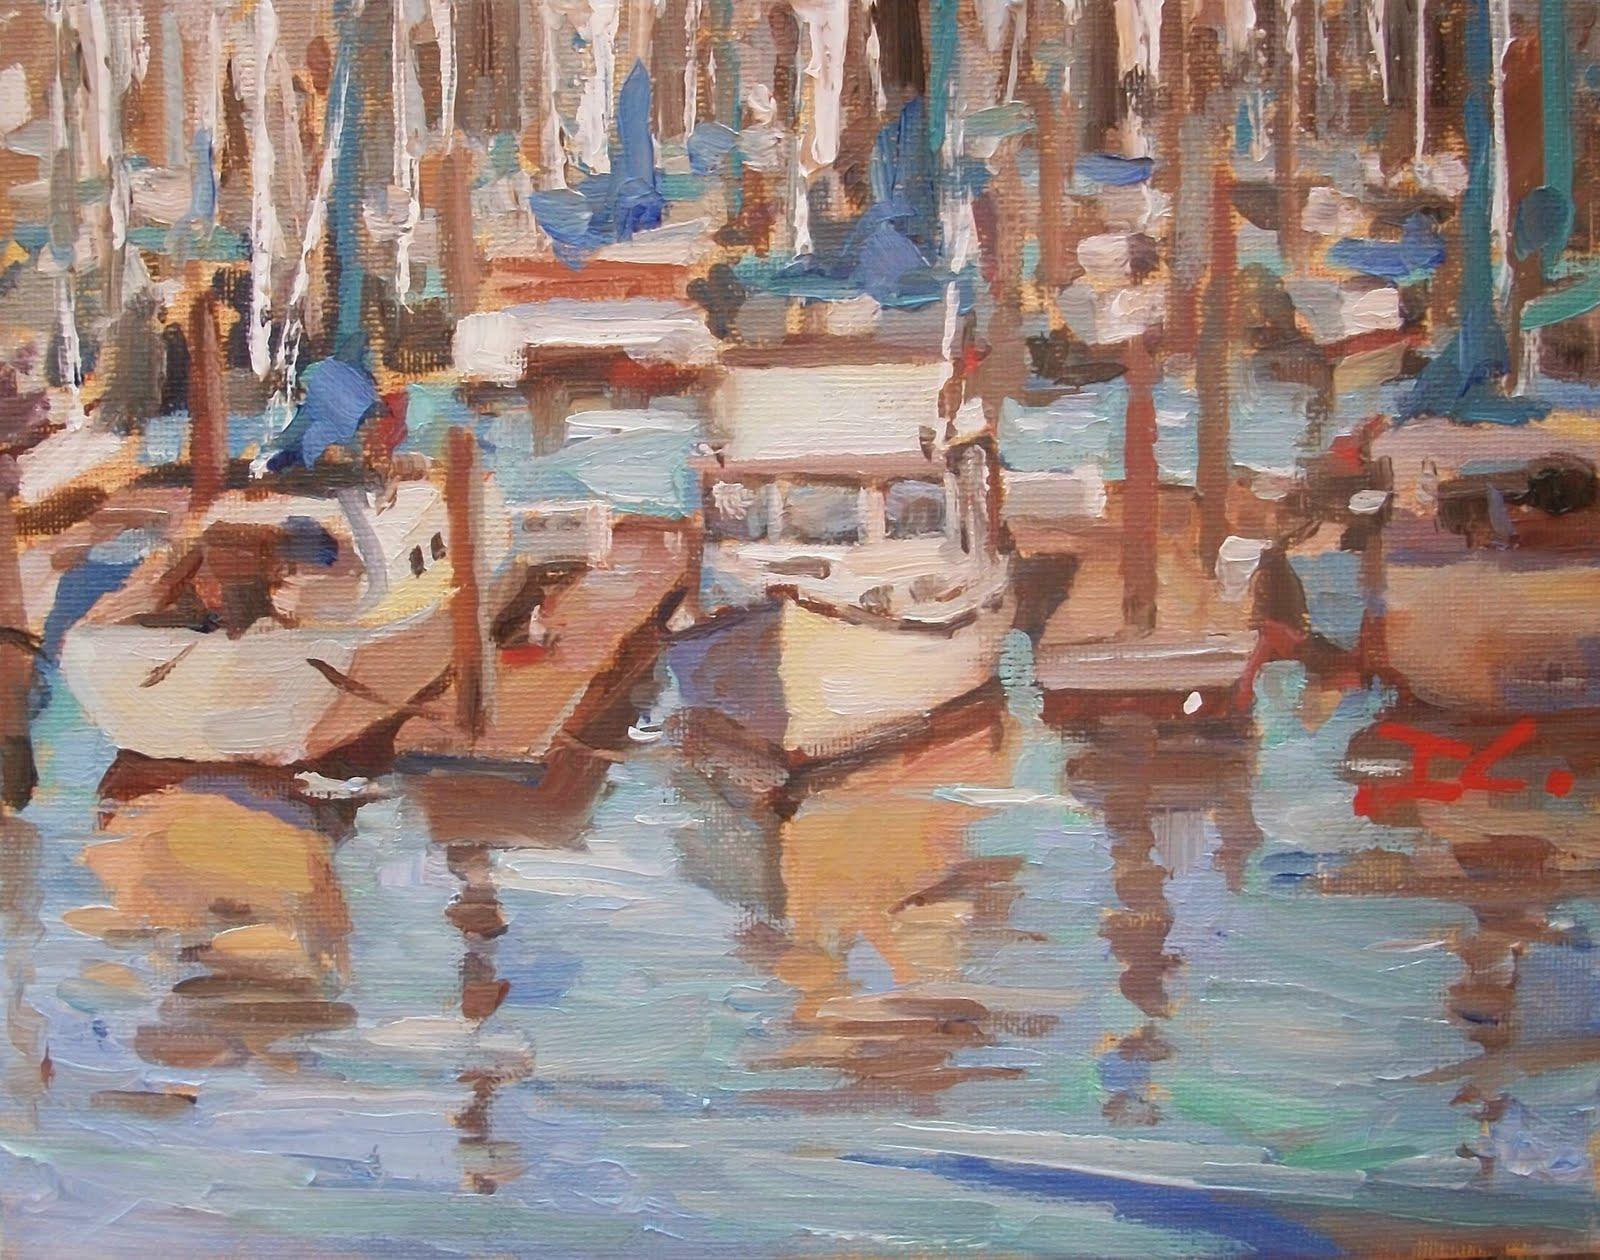 """1000 BOATS"" original fine art by Doug Carter"